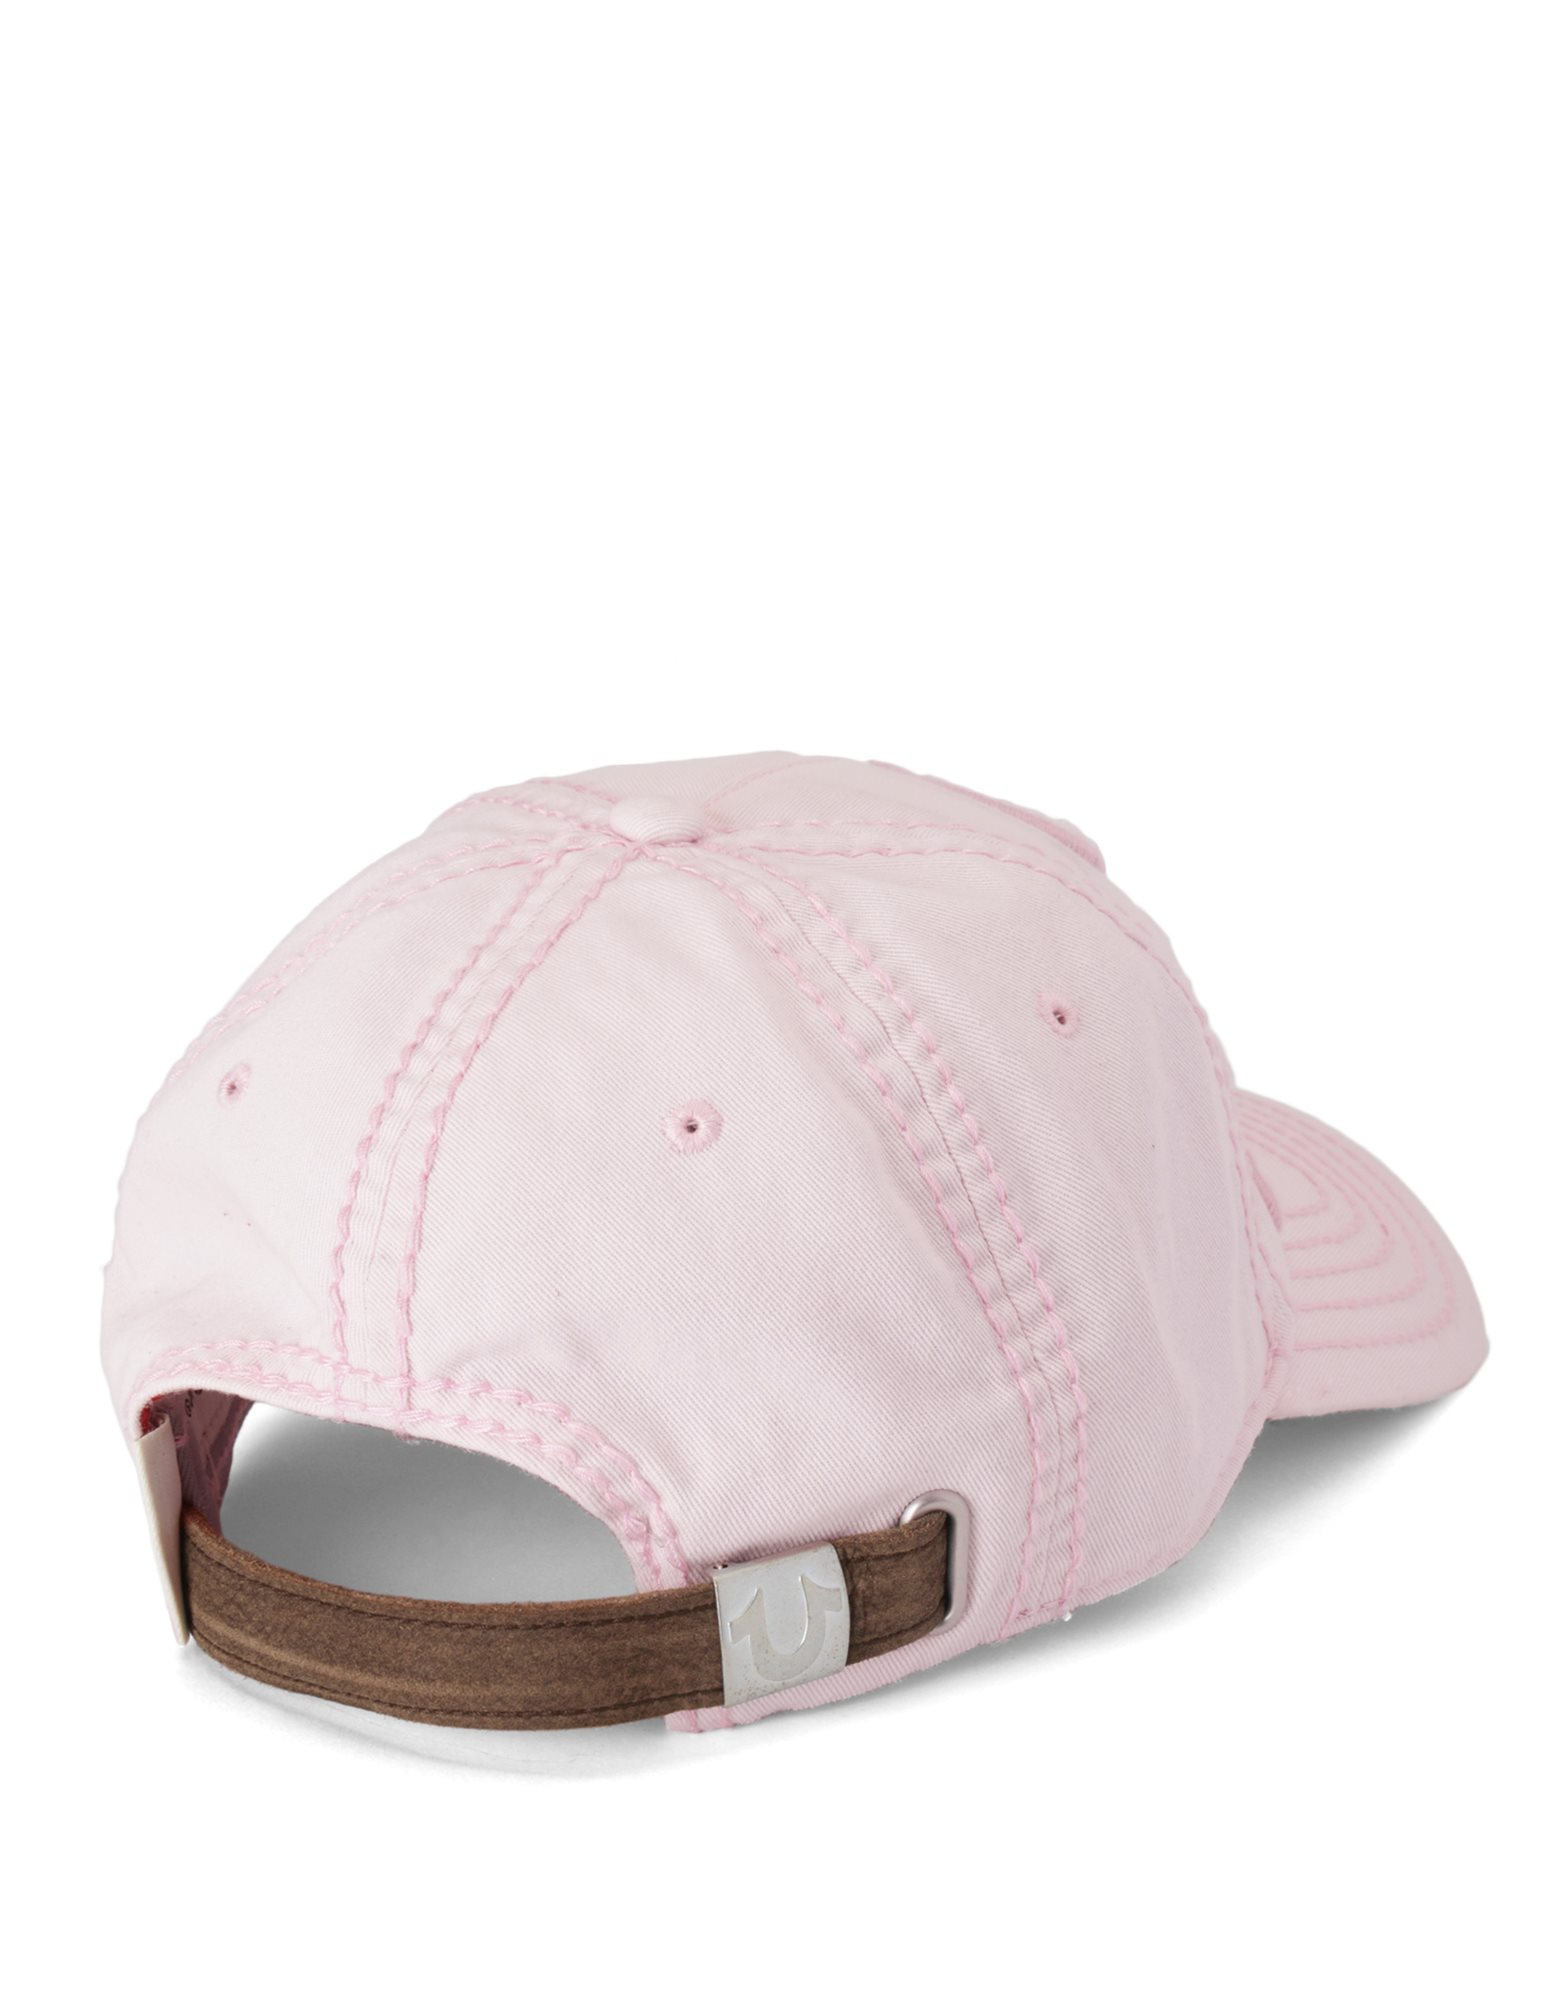 true religion tonal 3d logo womens baseball cap in pink